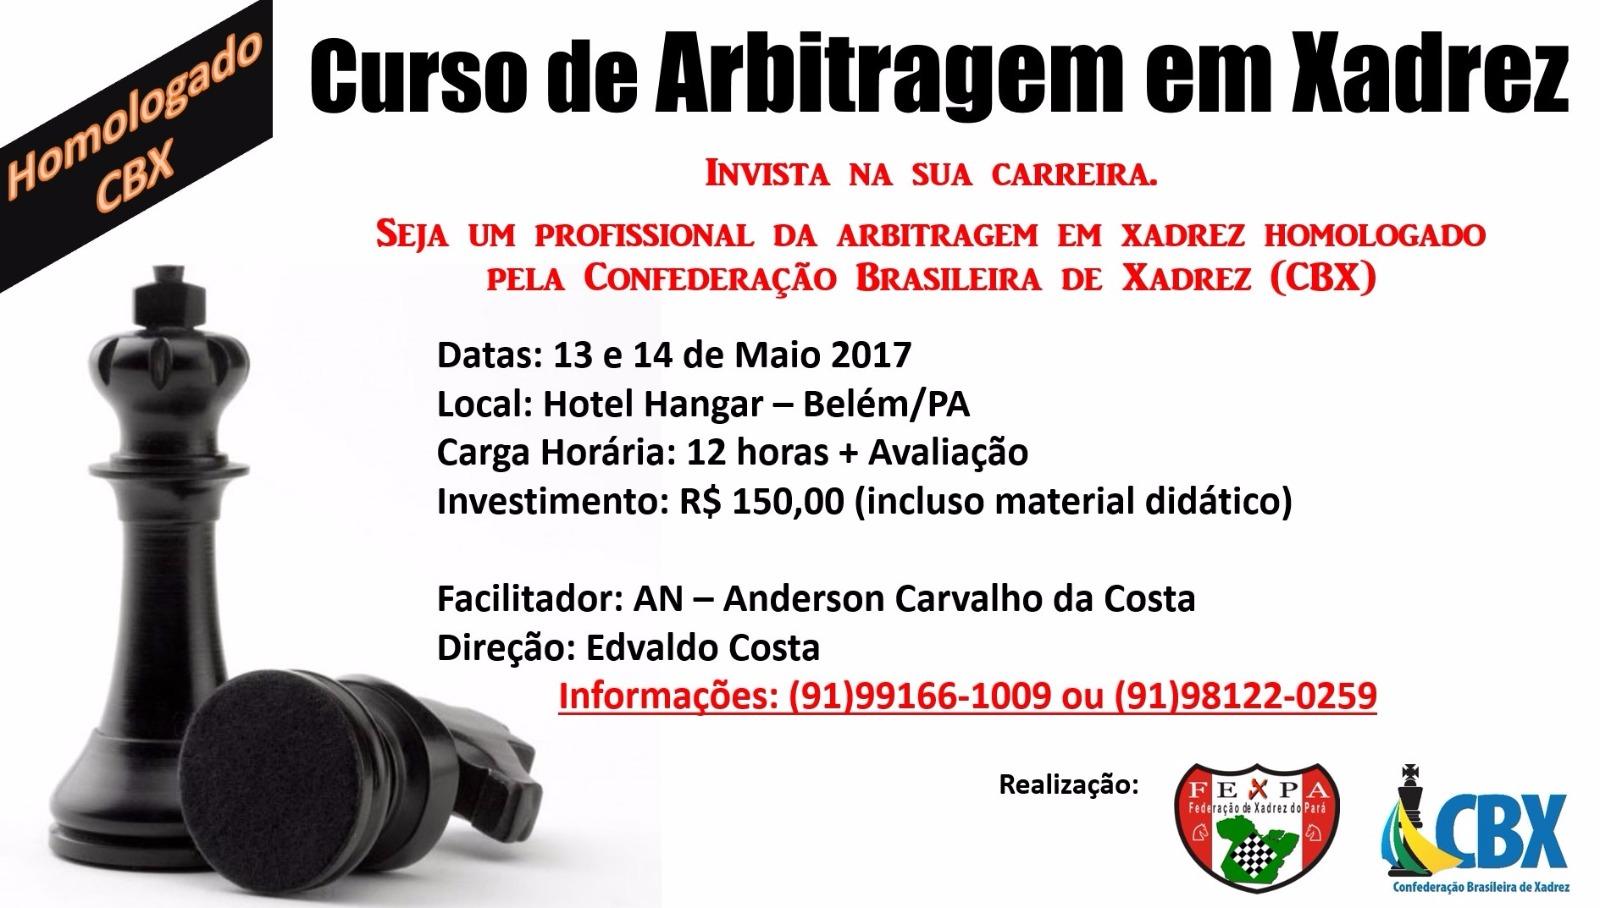 Curso de Arbitragem em Xadrez – ID CBX 3698/17